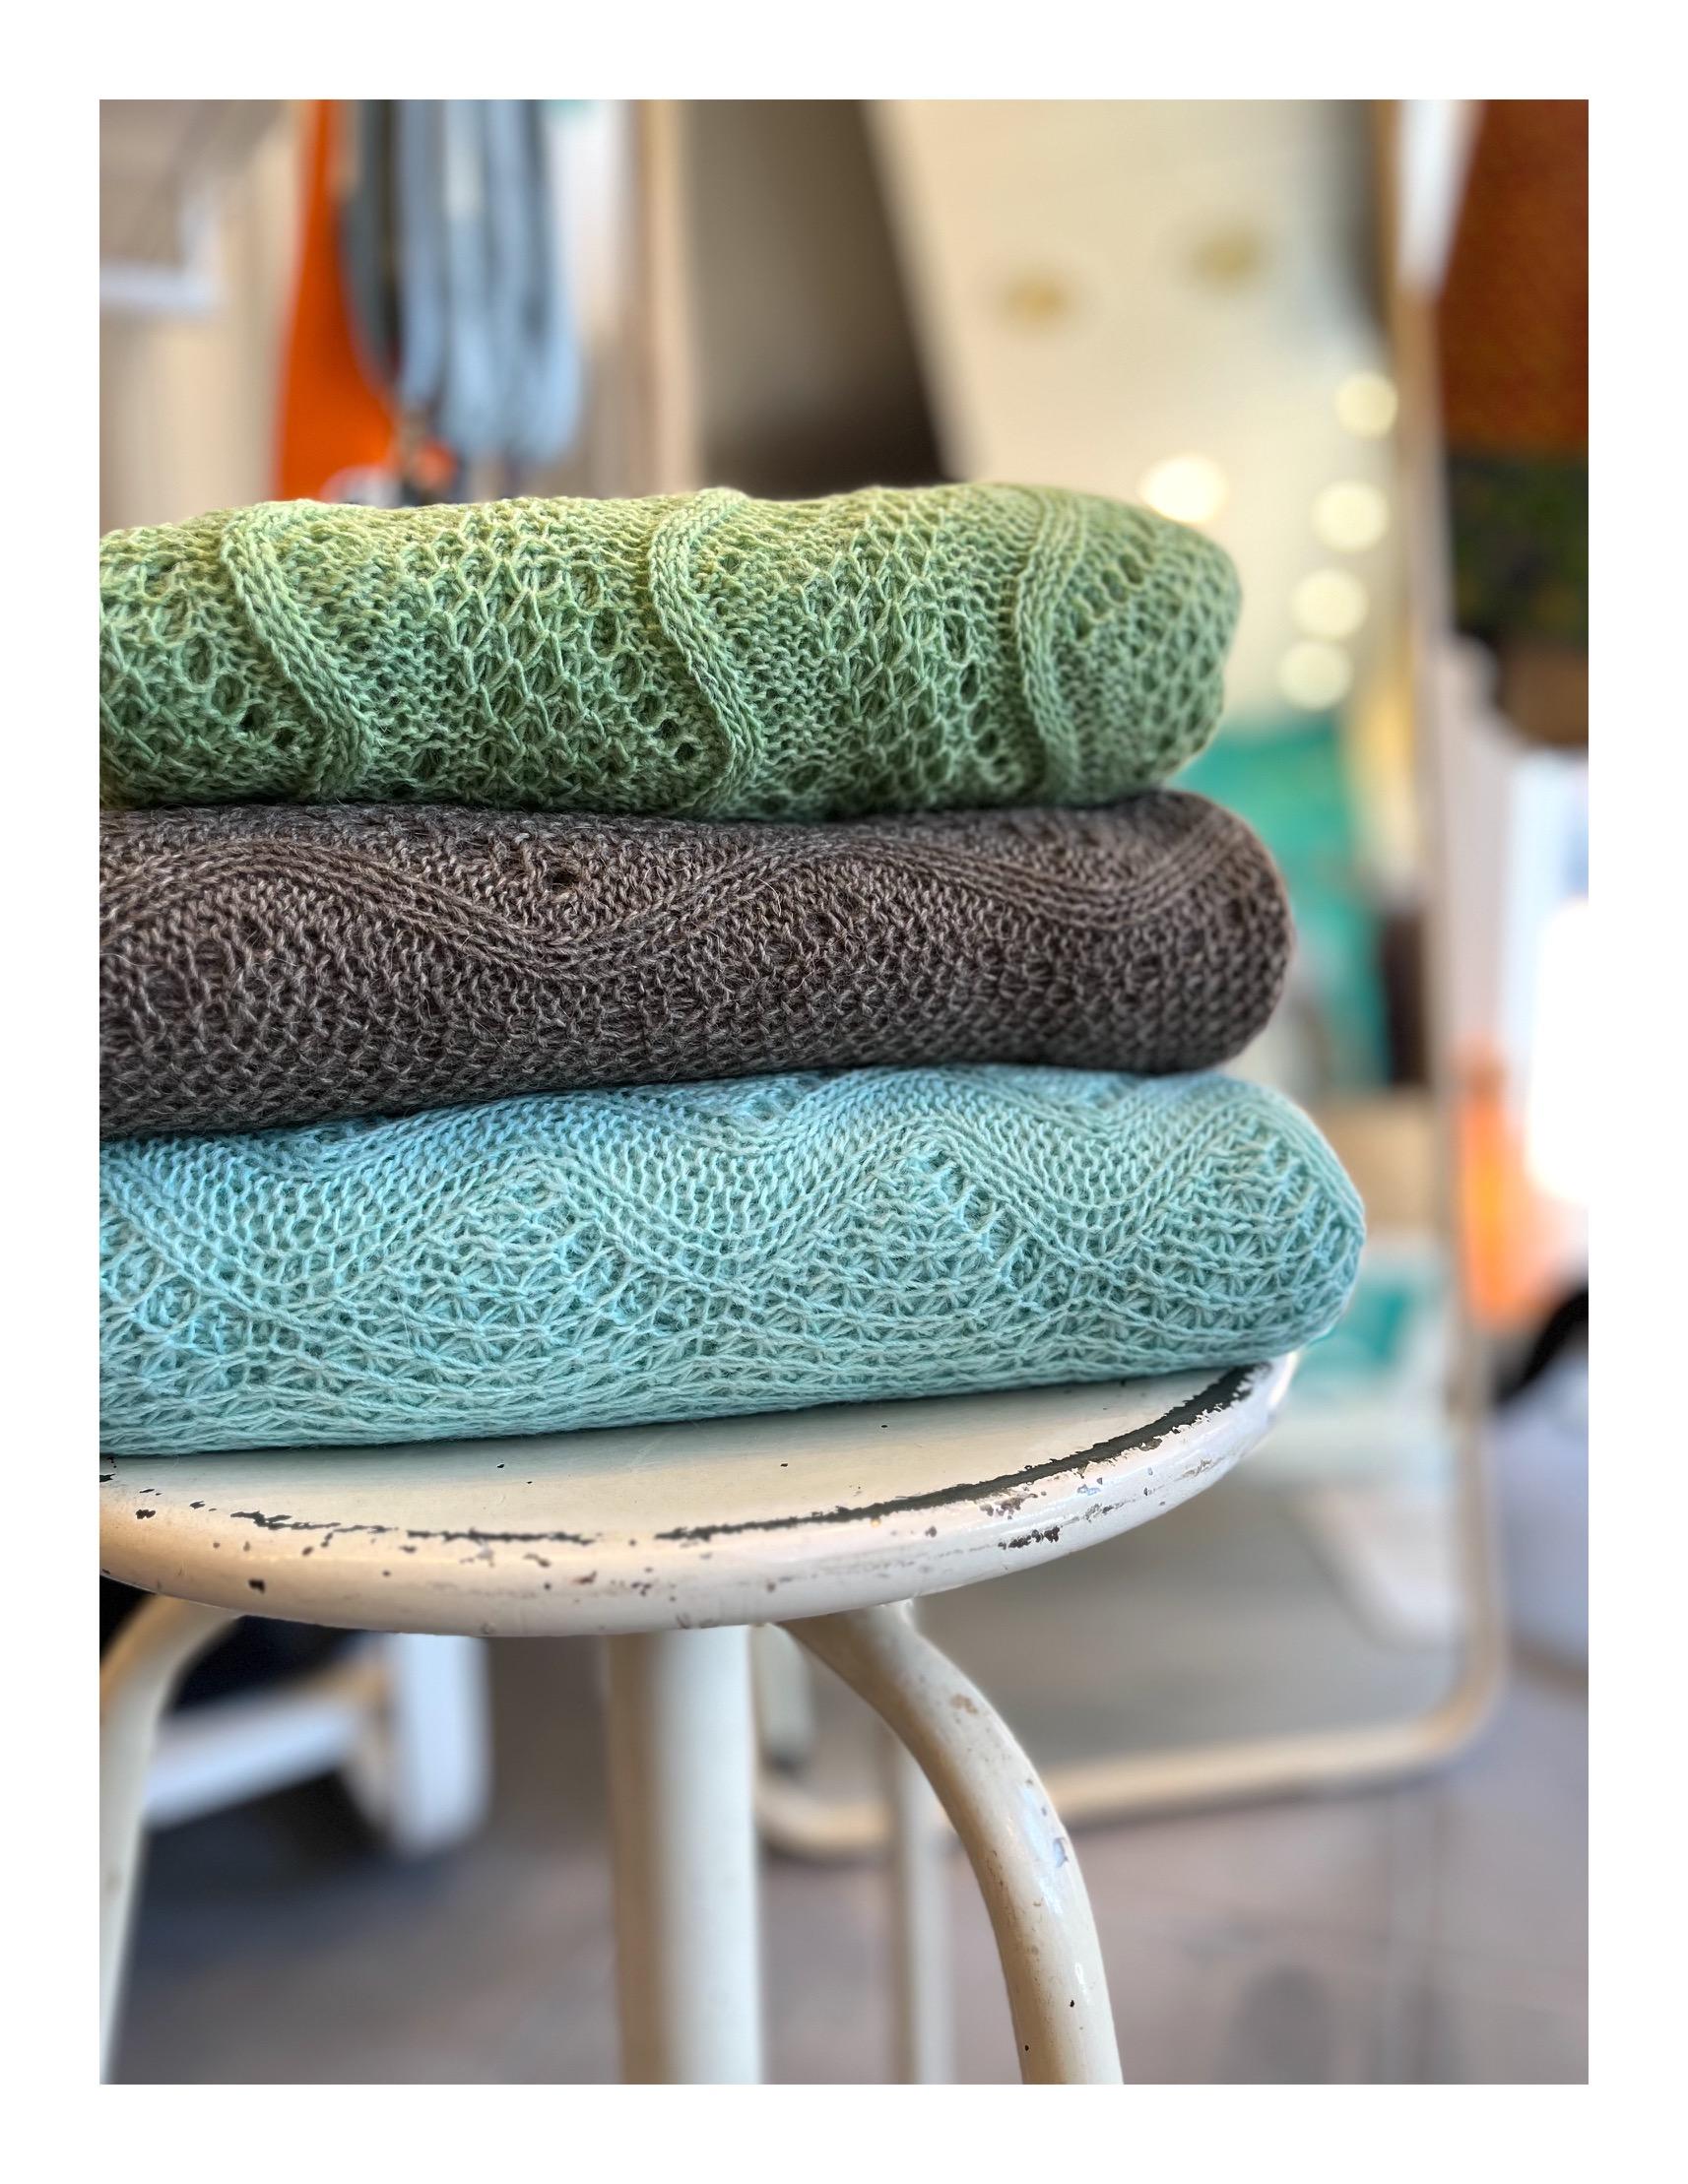 Otracosa art shawl Bram van Velde